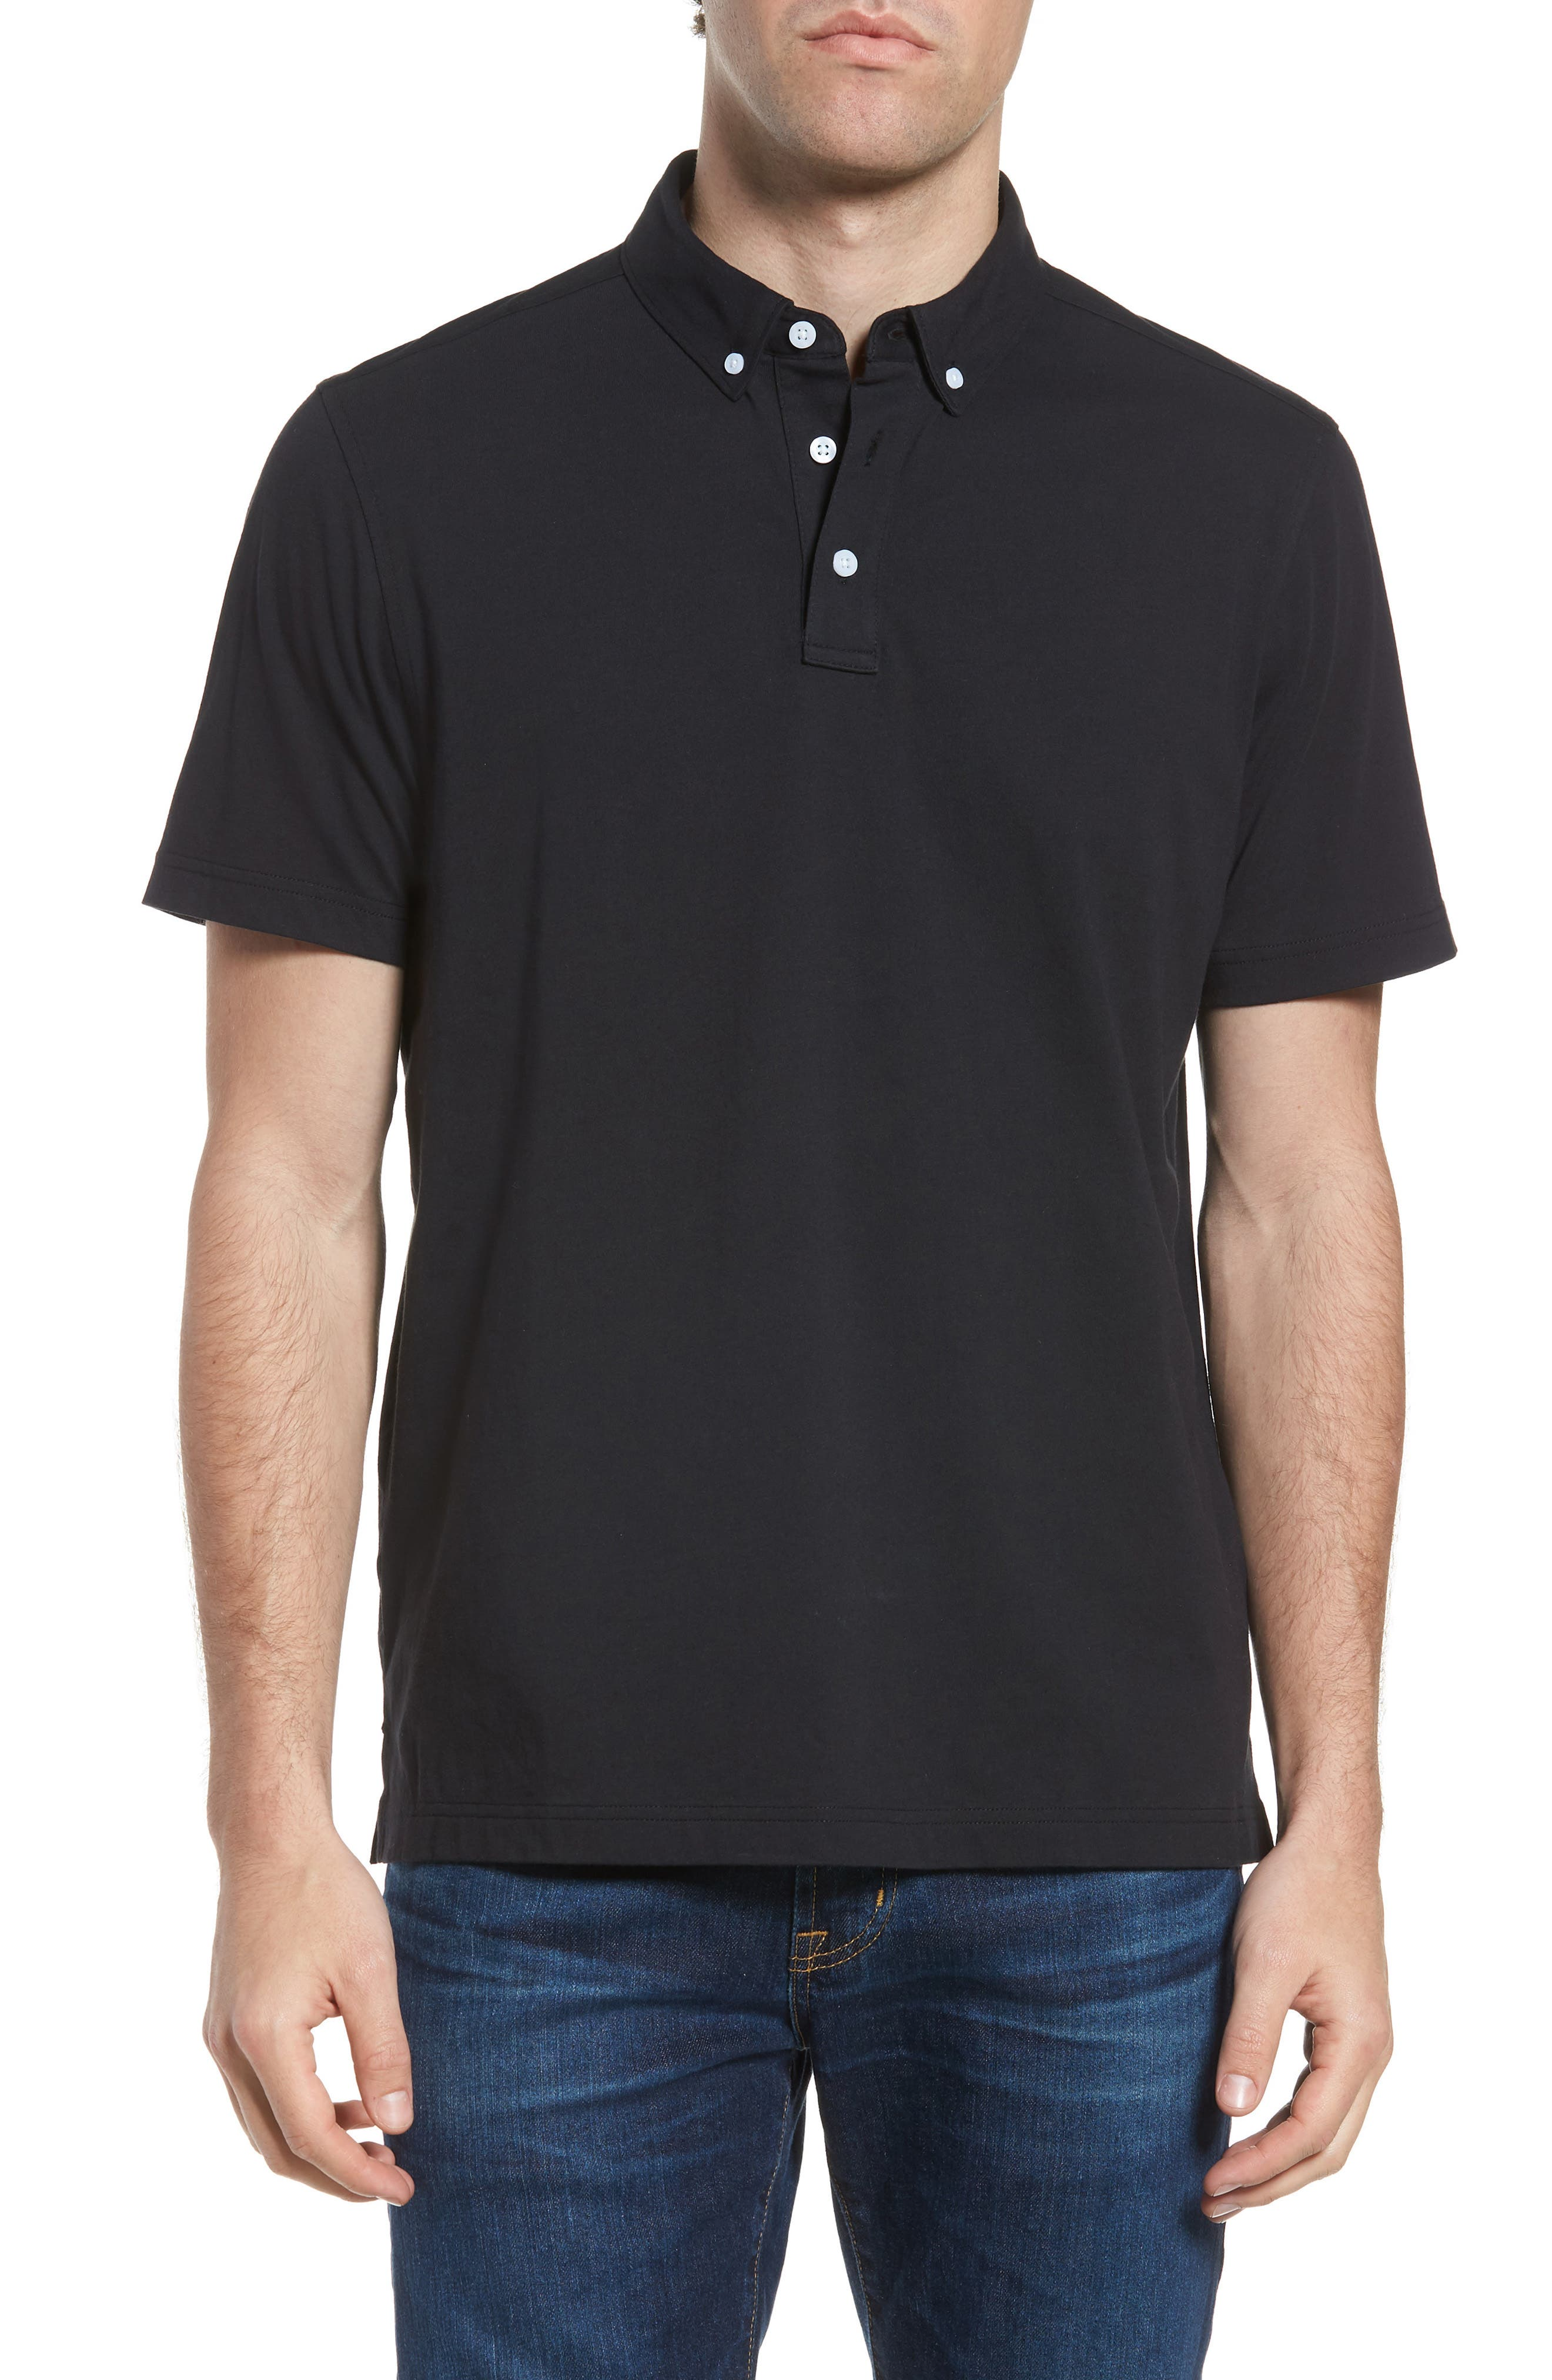 NORDSTROM MEN'S SHOP, Regular Fit Polo, Main thumbnail 1, color, BLACK